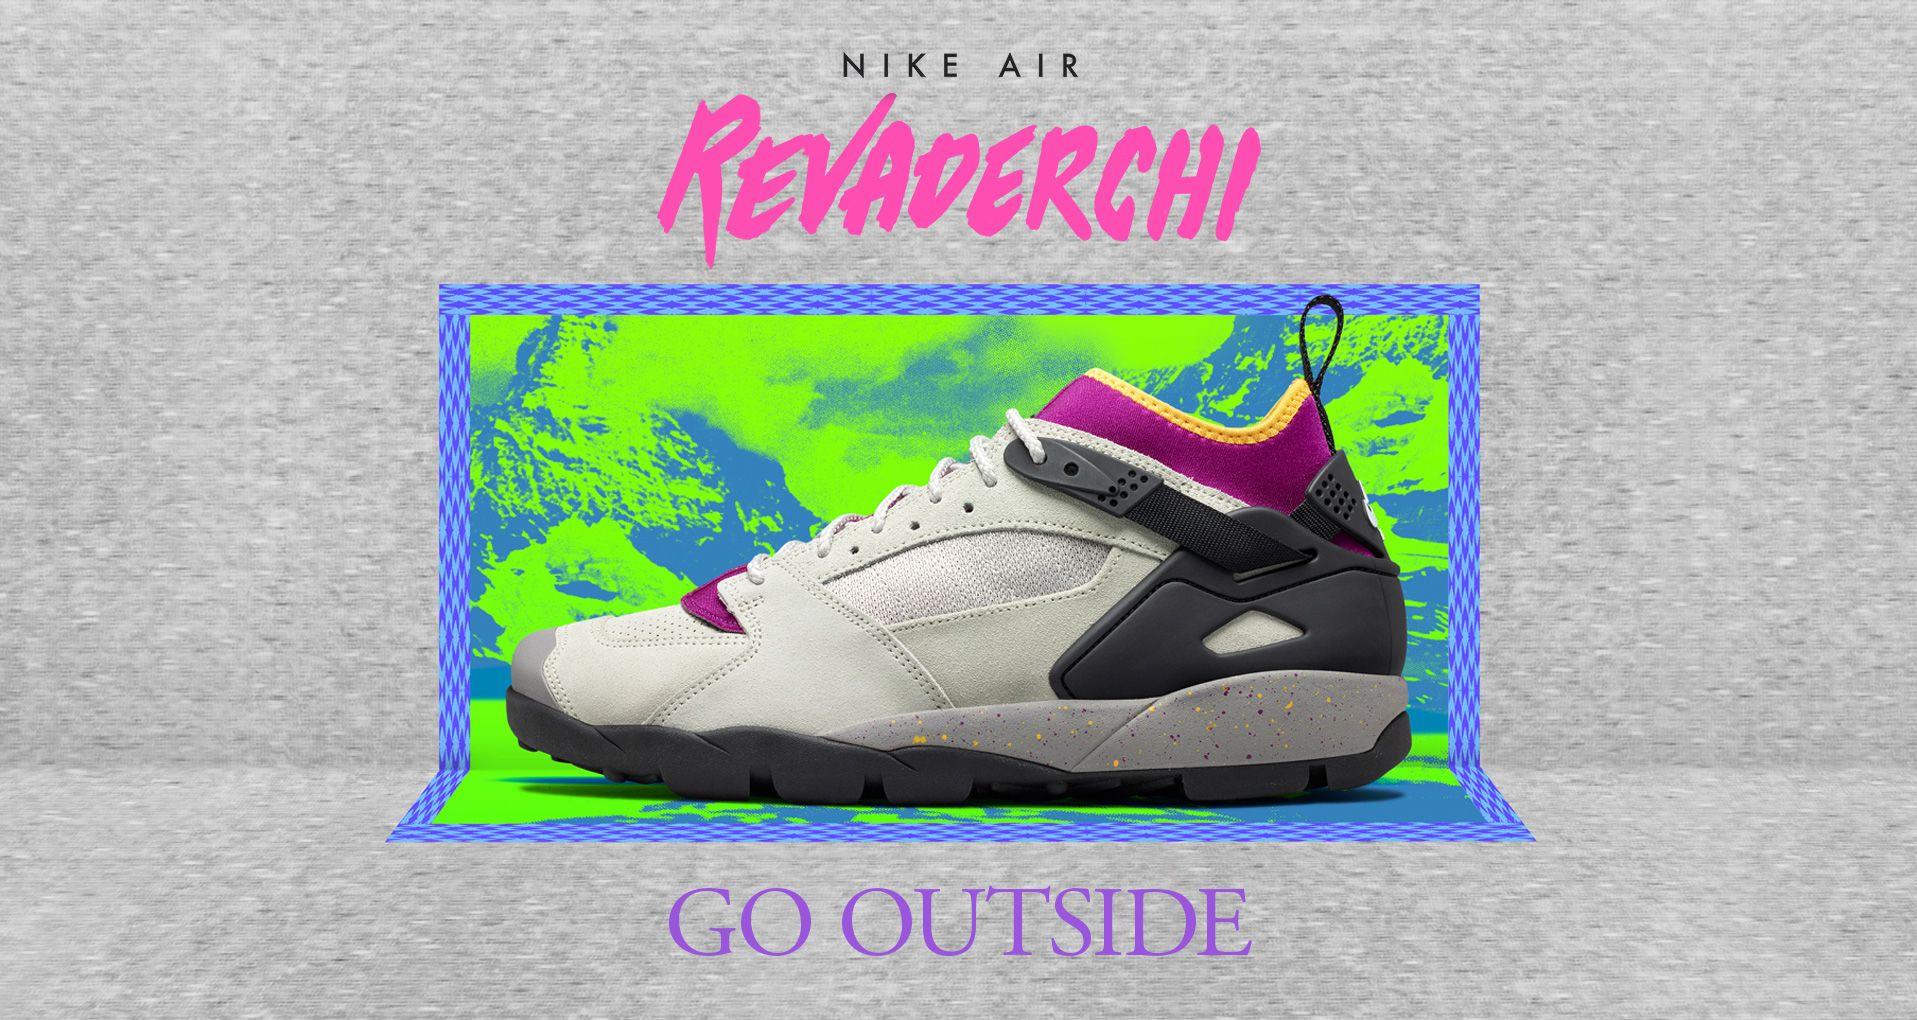 211171fff0f5 Nike Air Revaderchi  Granite   Red Plum  Release Date. Nike+ SNKRS